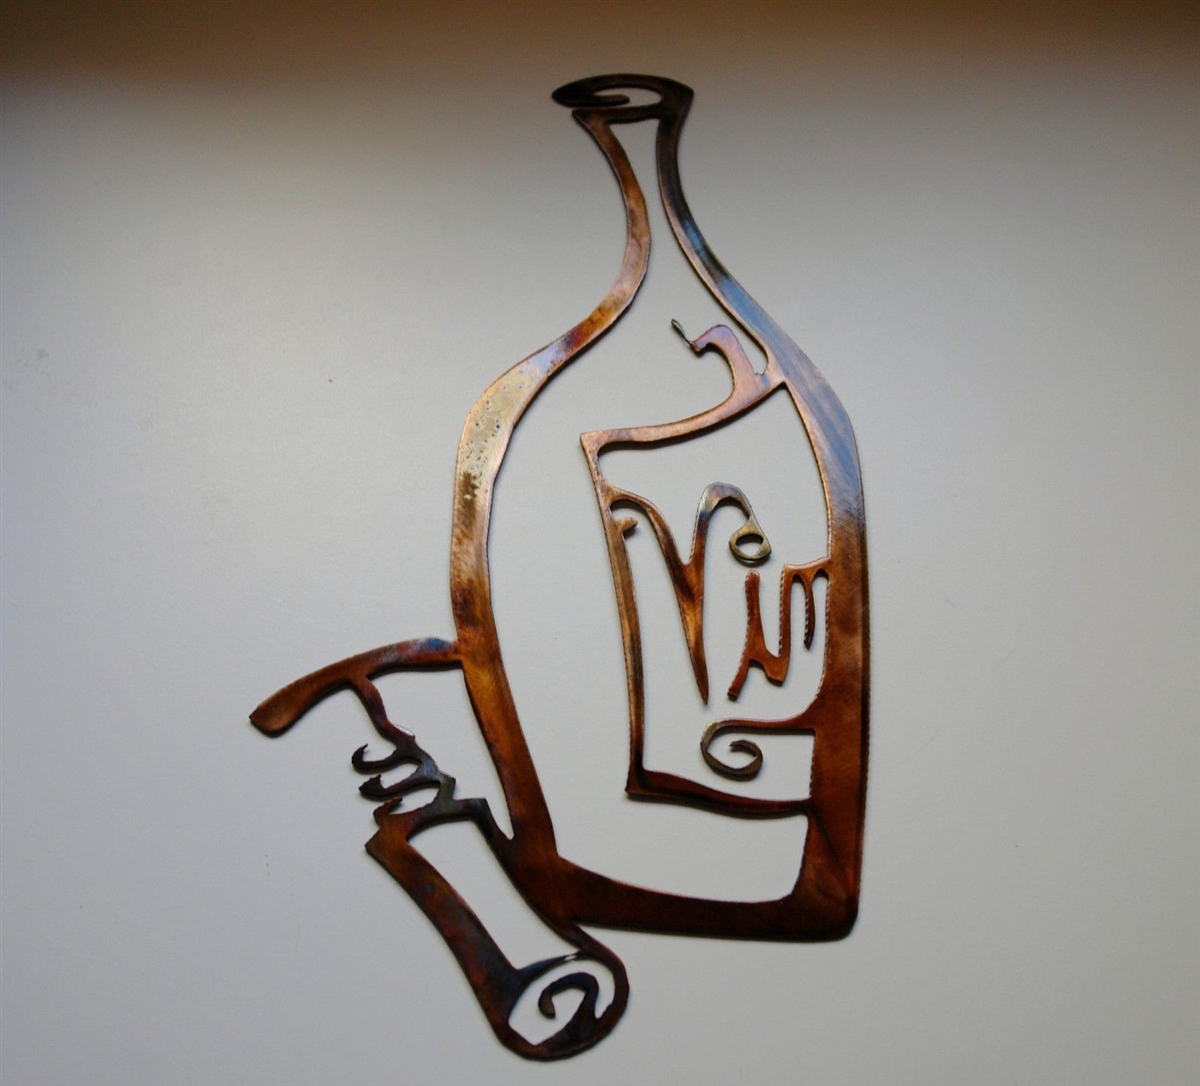 Vino! Metal Wall Art Decor, Wine Bottle and opener Copper ...